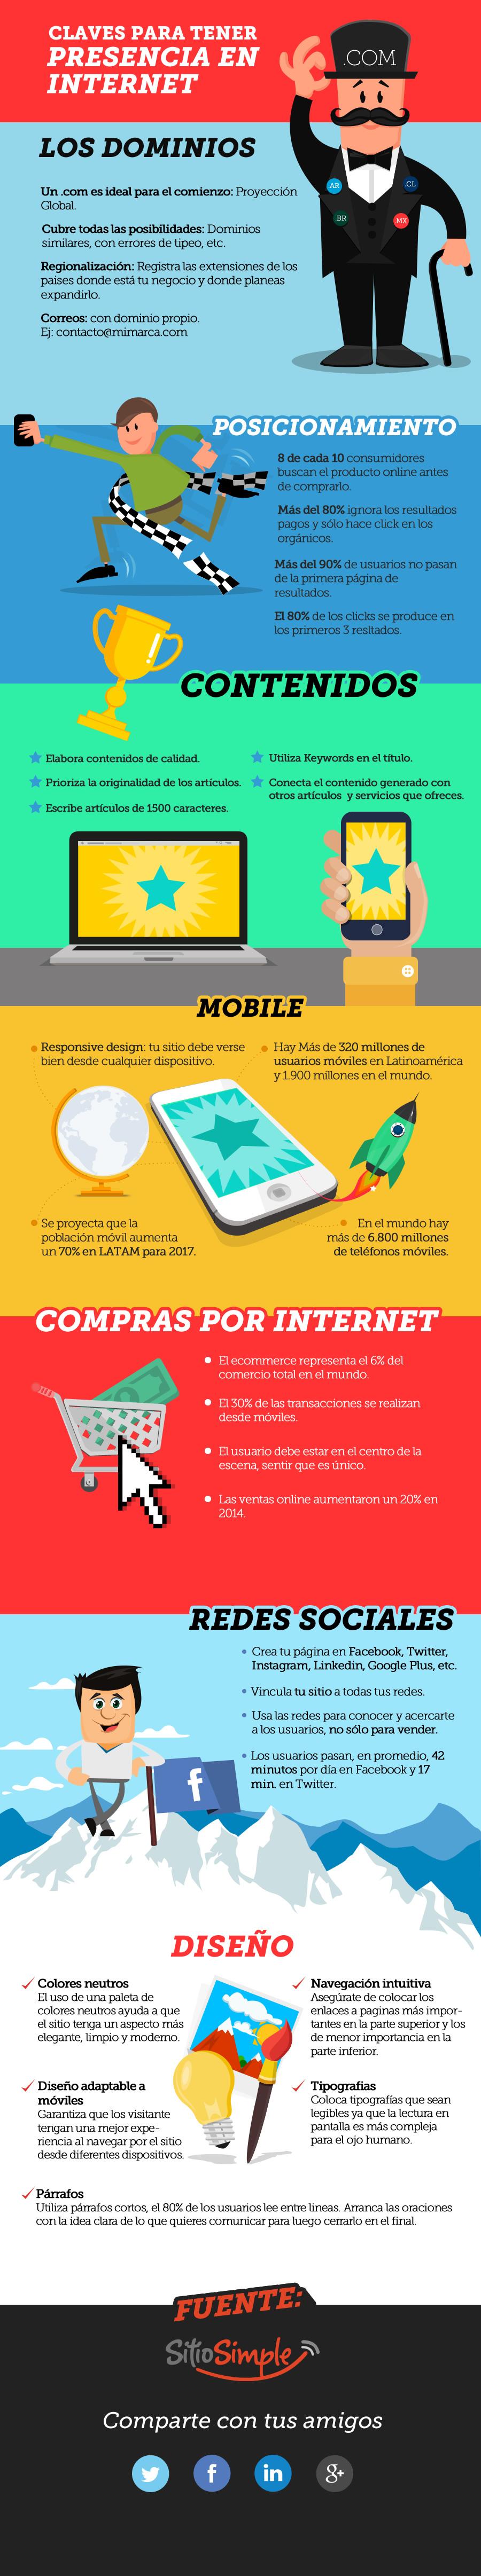 infografia_presencia_internet-2